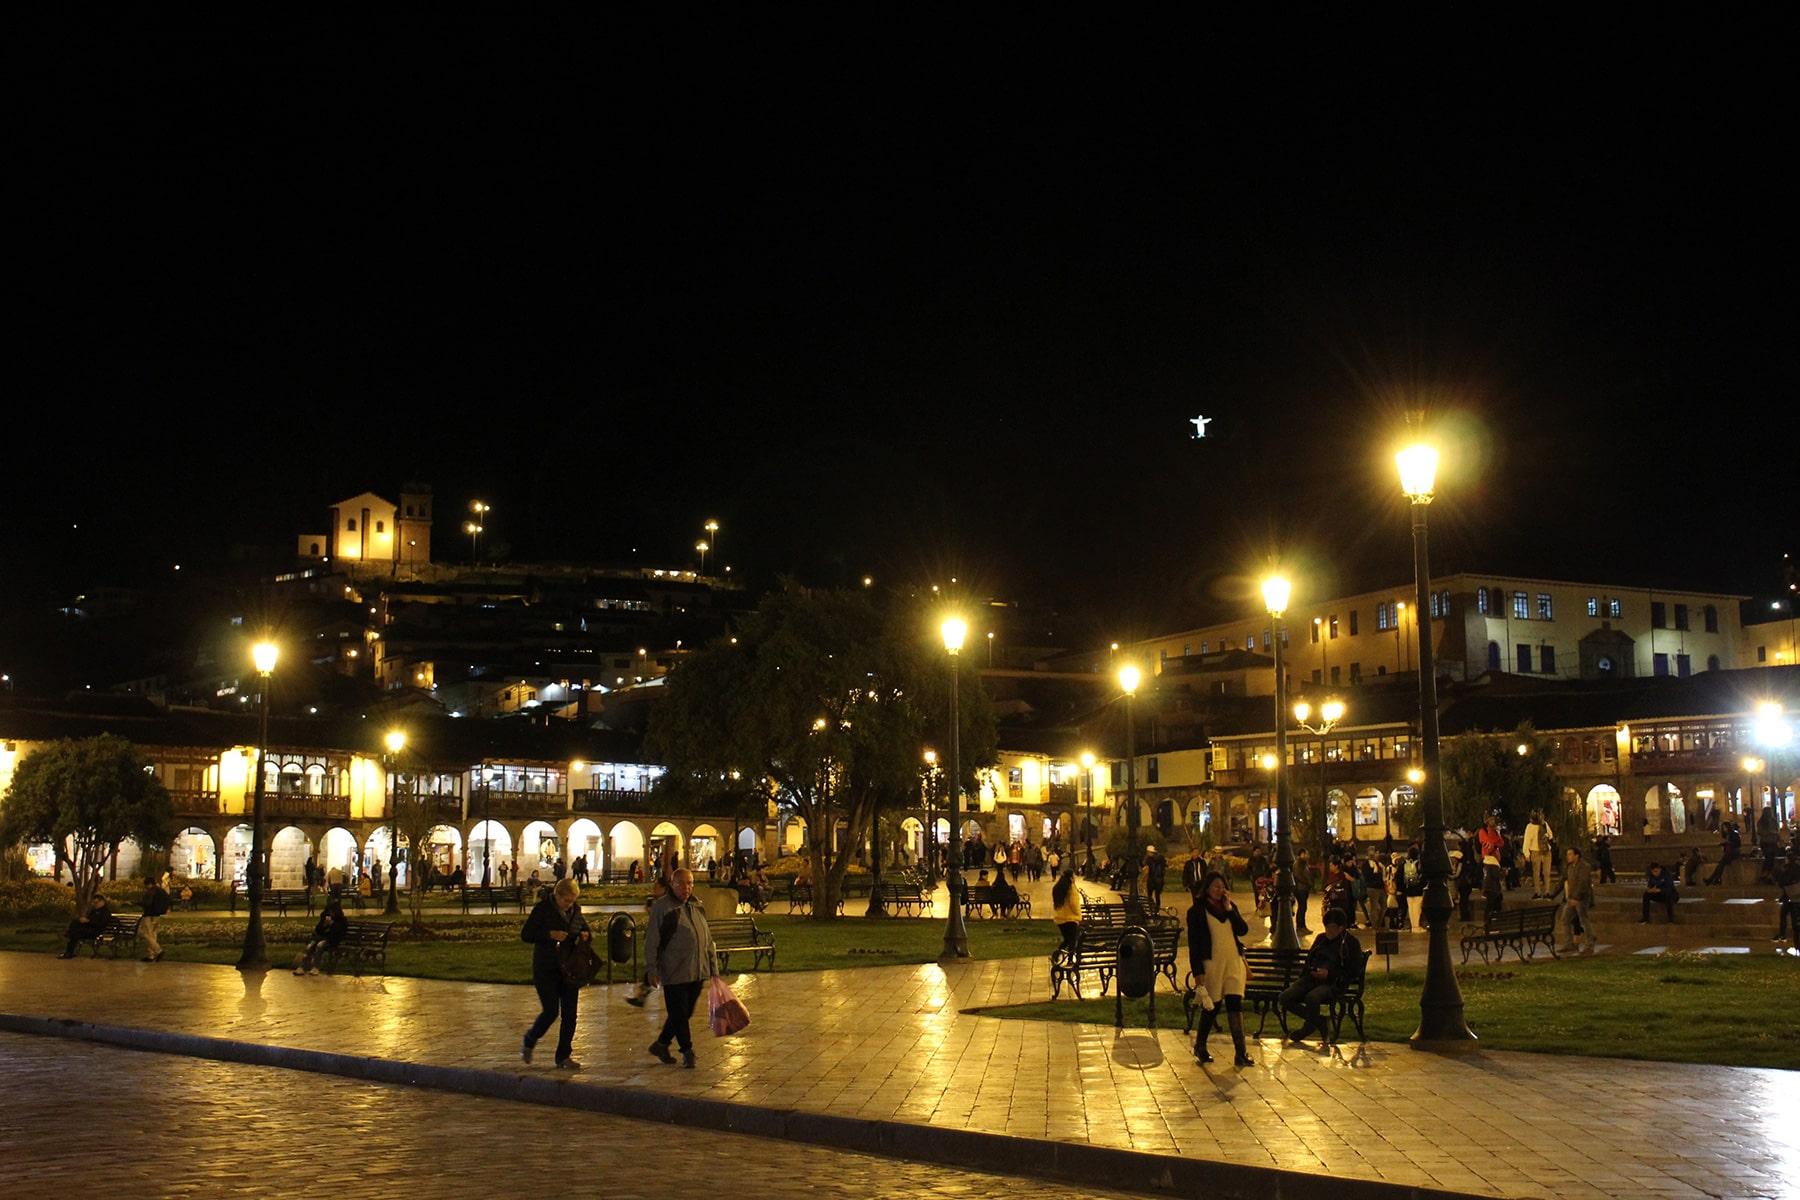 Cuzco plaza de armas at night with Christ statue